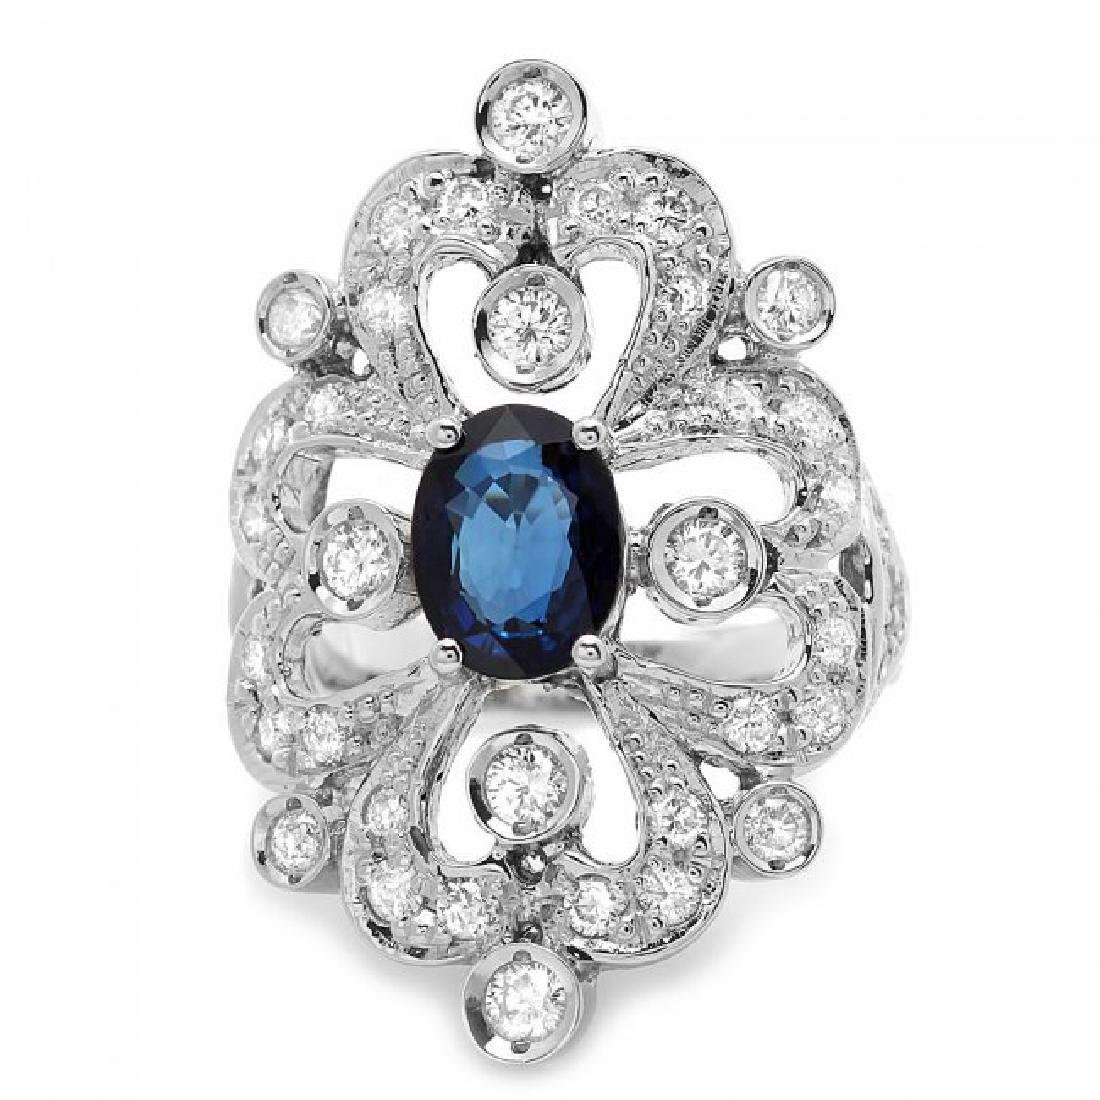 14k Gold 1.70ct Sapphire 1.30ct Diamond Ring - 3